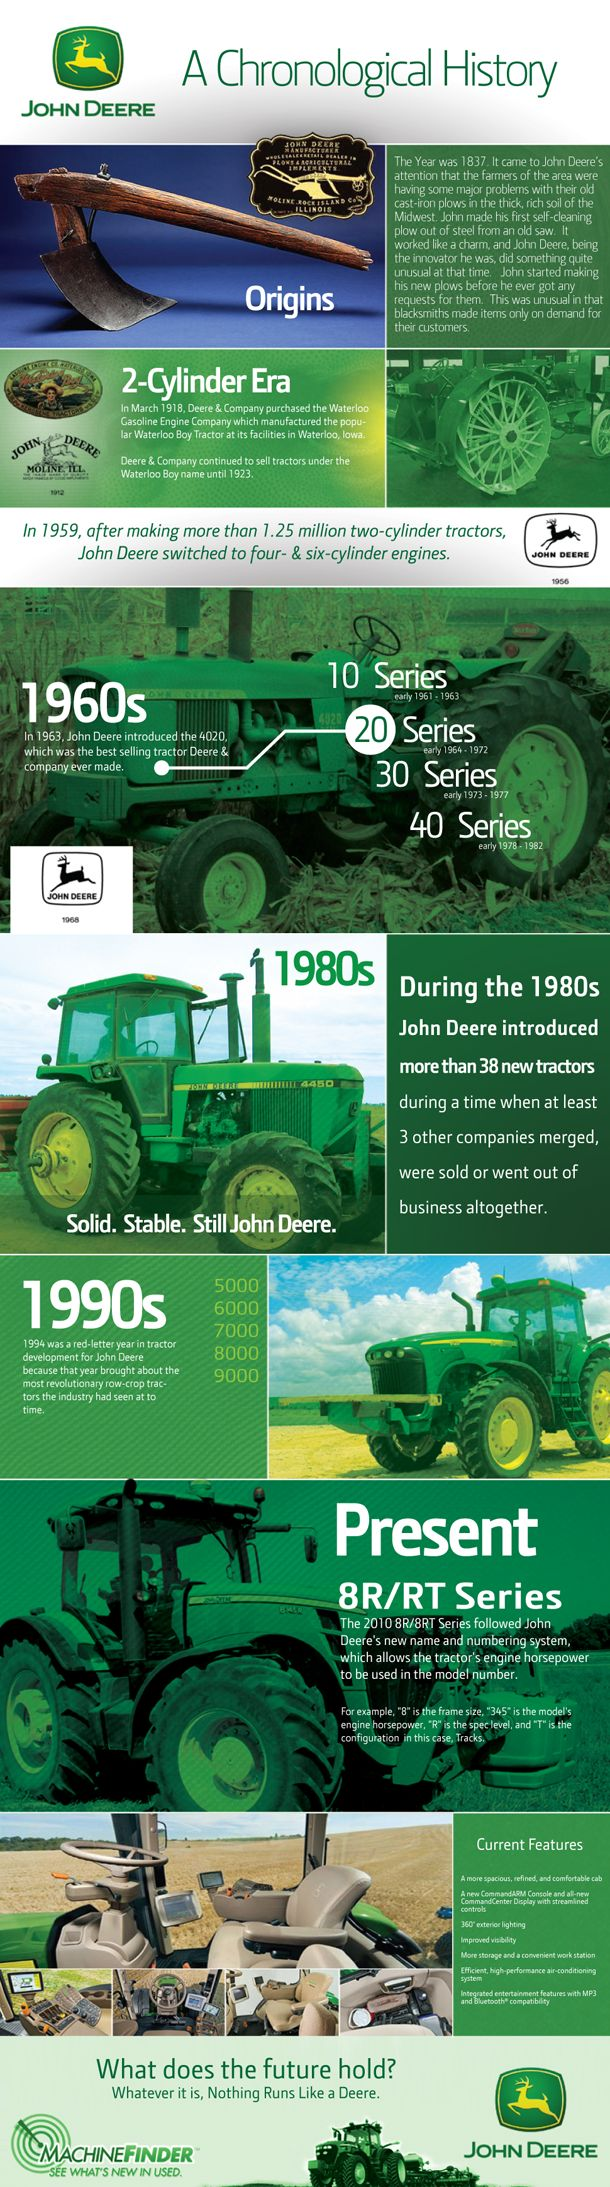 Evolution of the John Deere Tractor Infographic